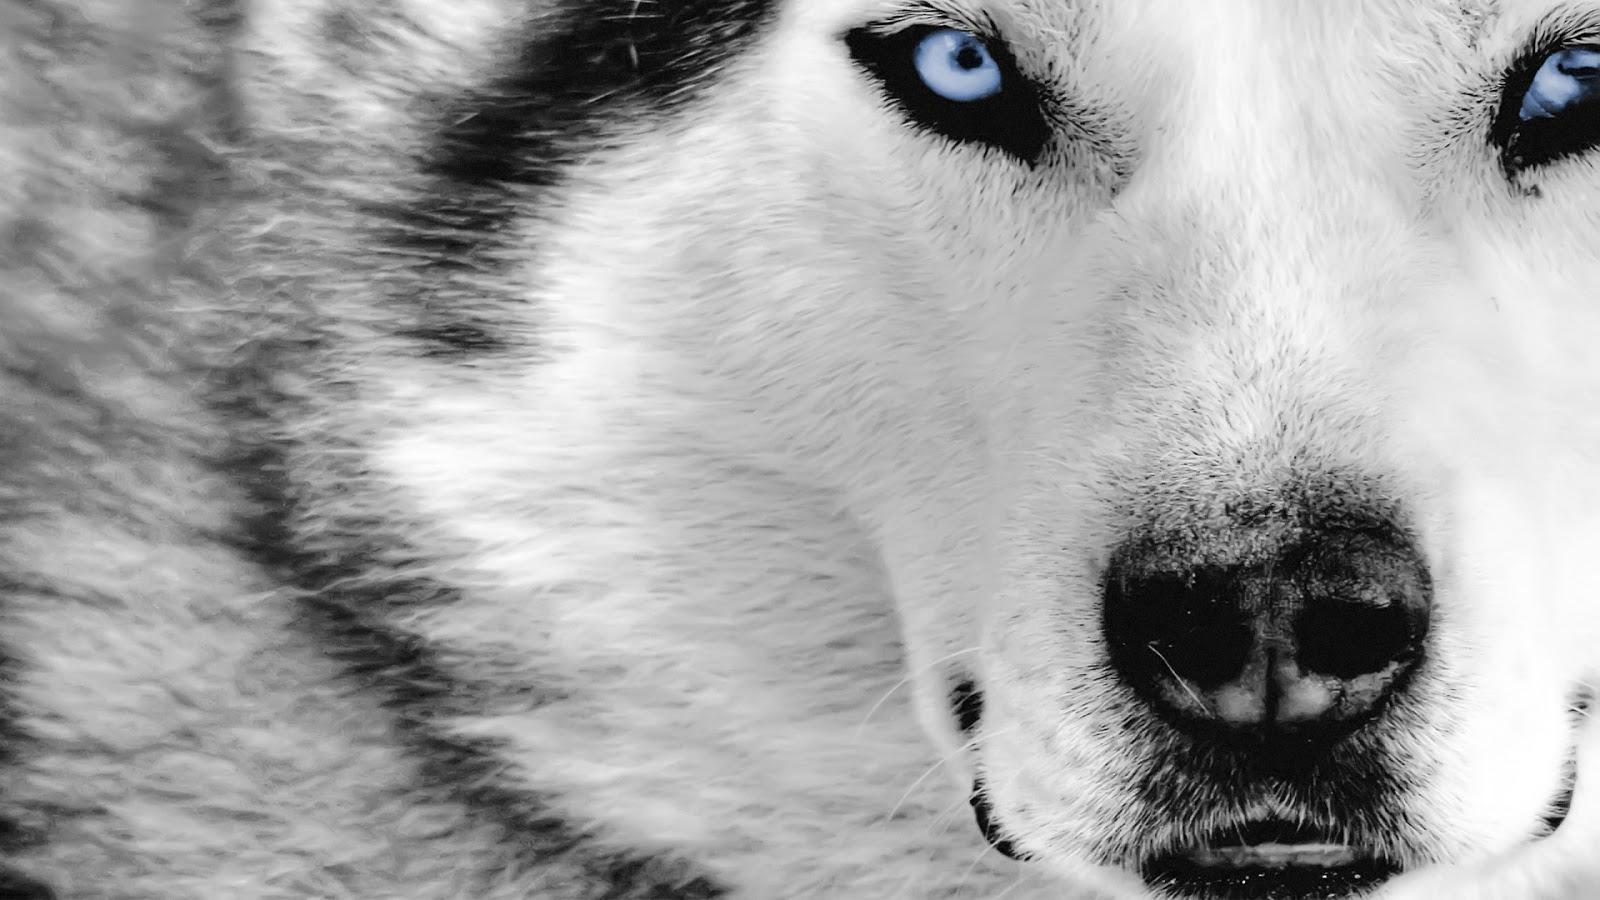 wolf 1080p hd wallpaper latest hd wallpapers